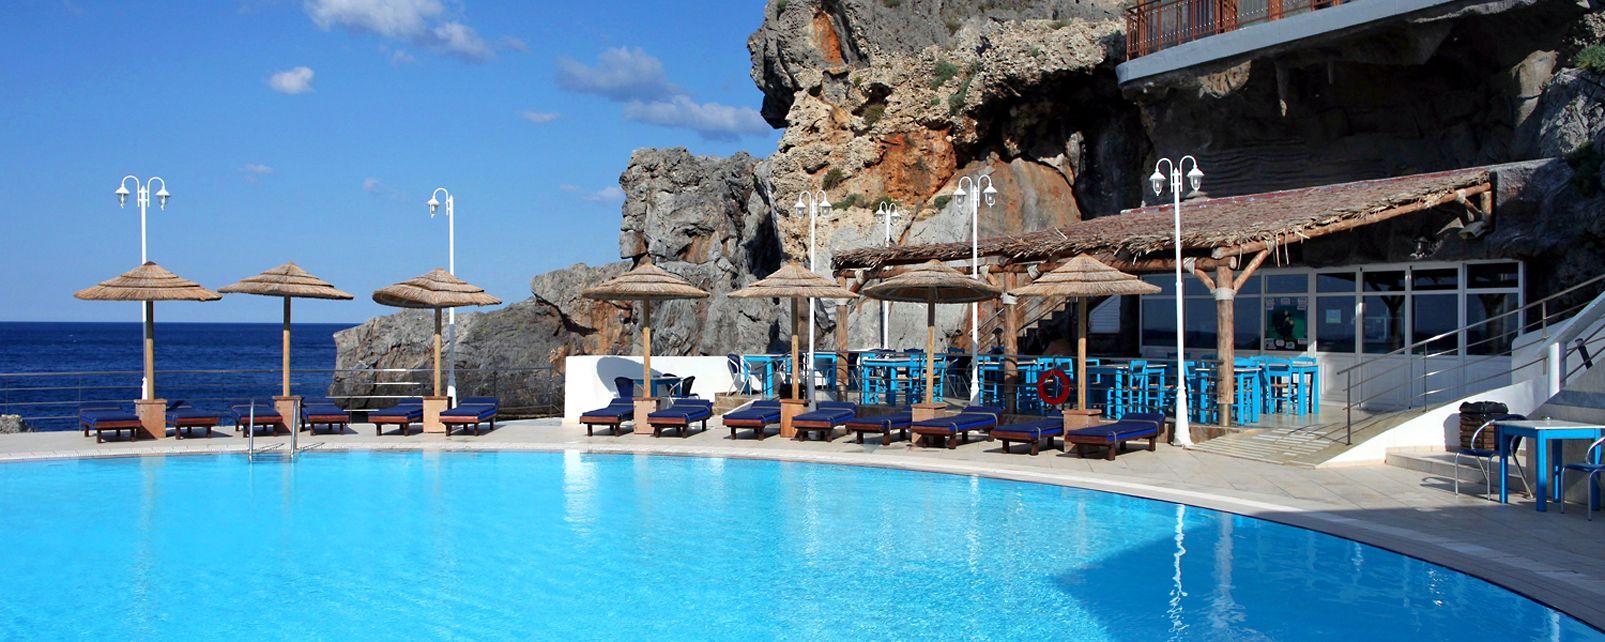 Hotel Kalypso Plakias